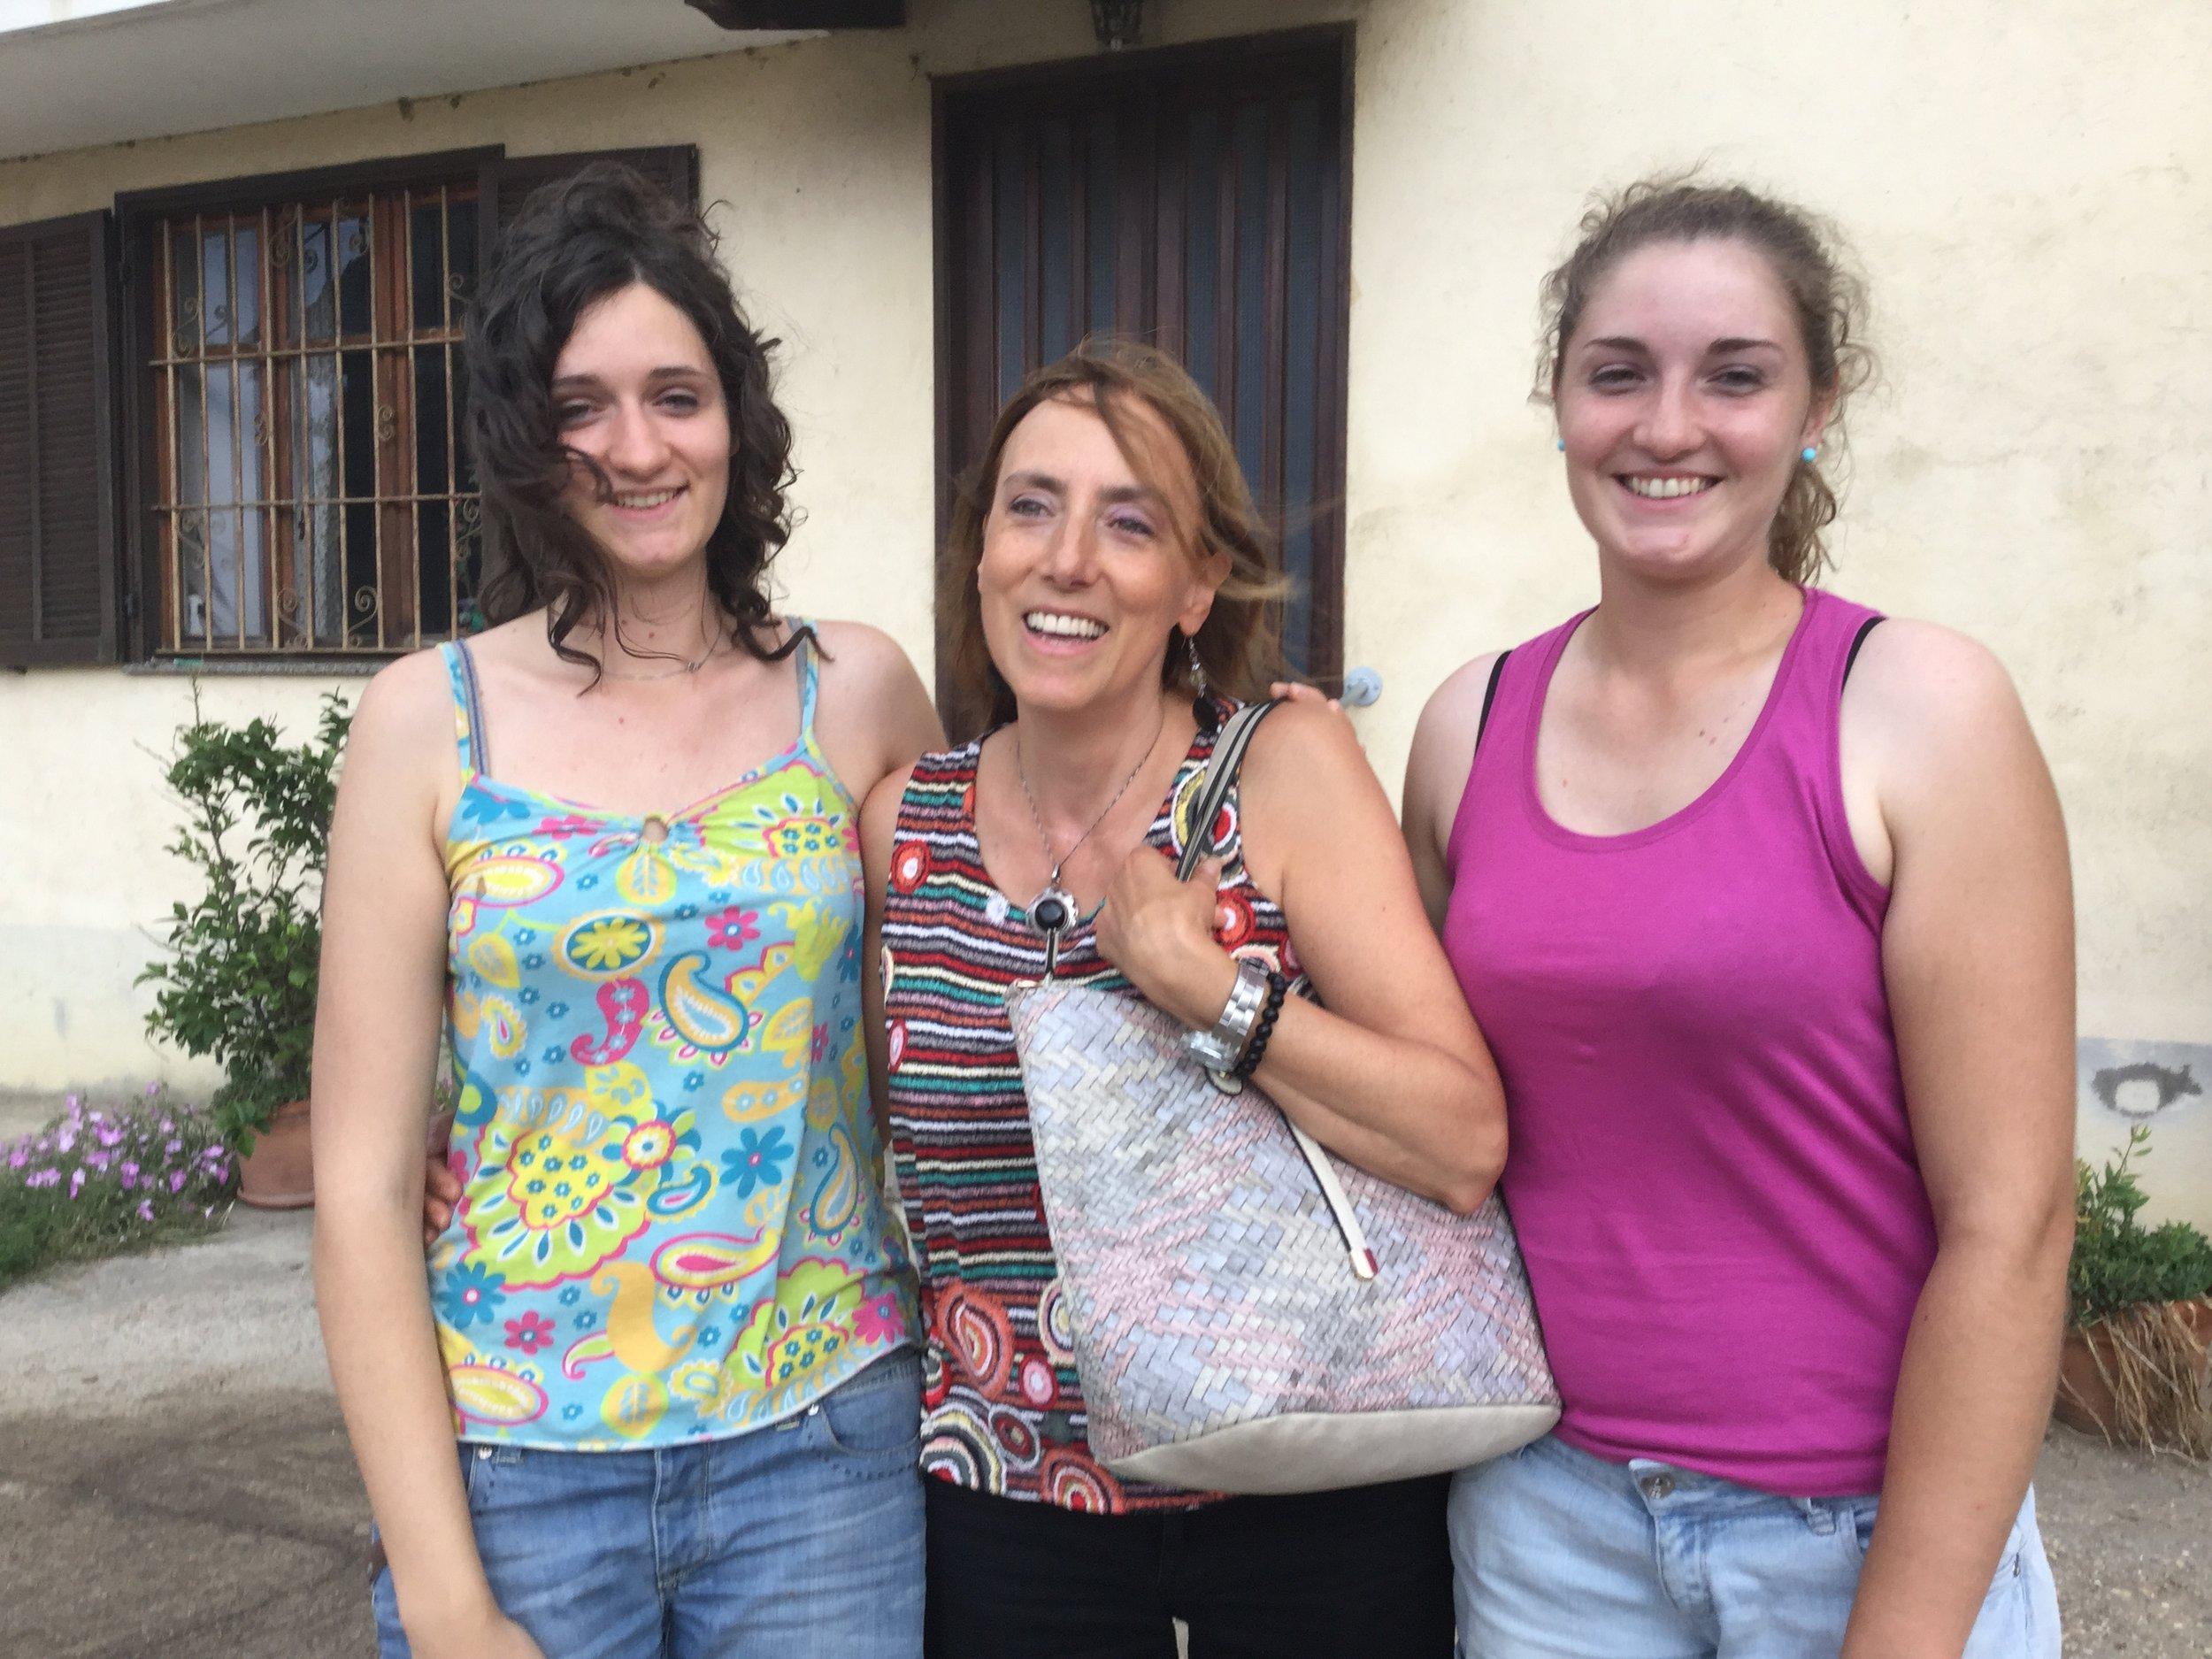 Lidia and her cousin Fiorella's daughters Roberta and Cristina.